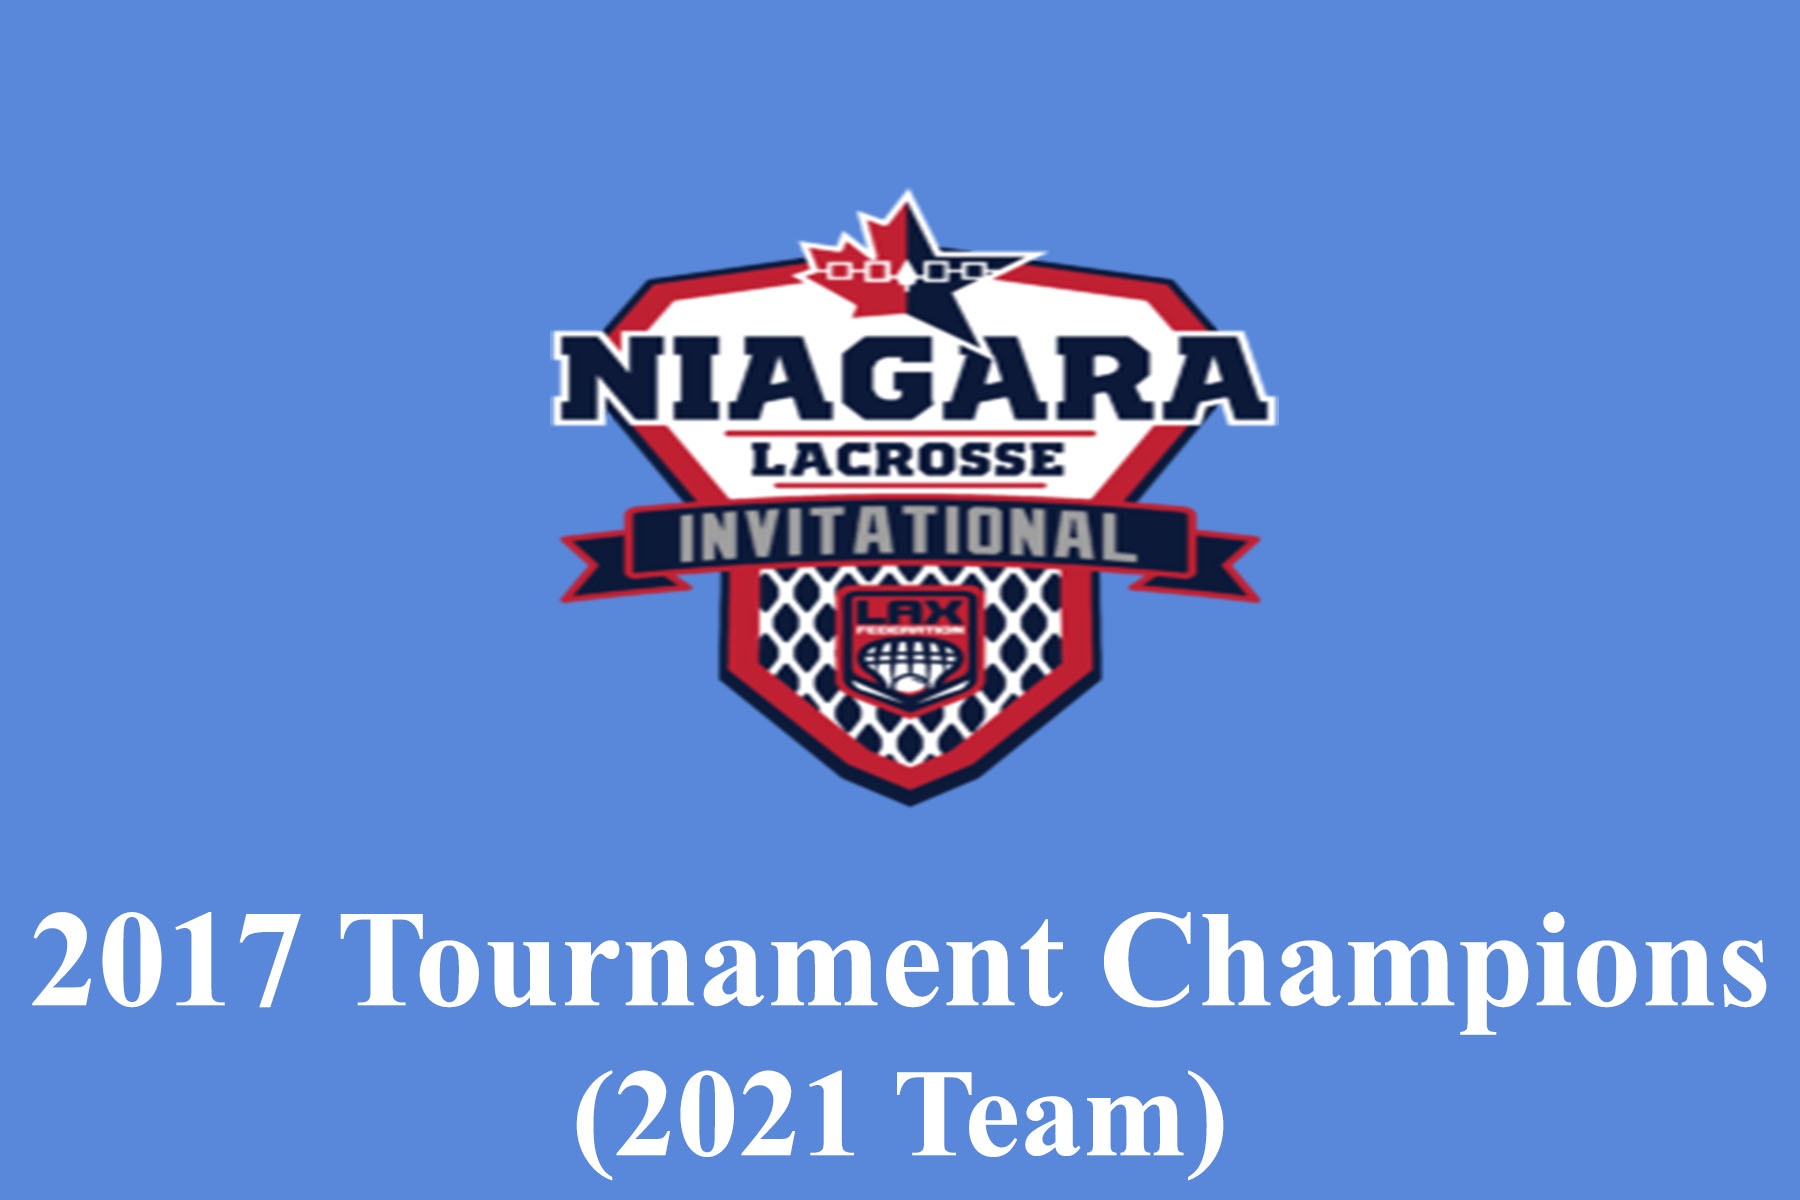 nls 2021 team